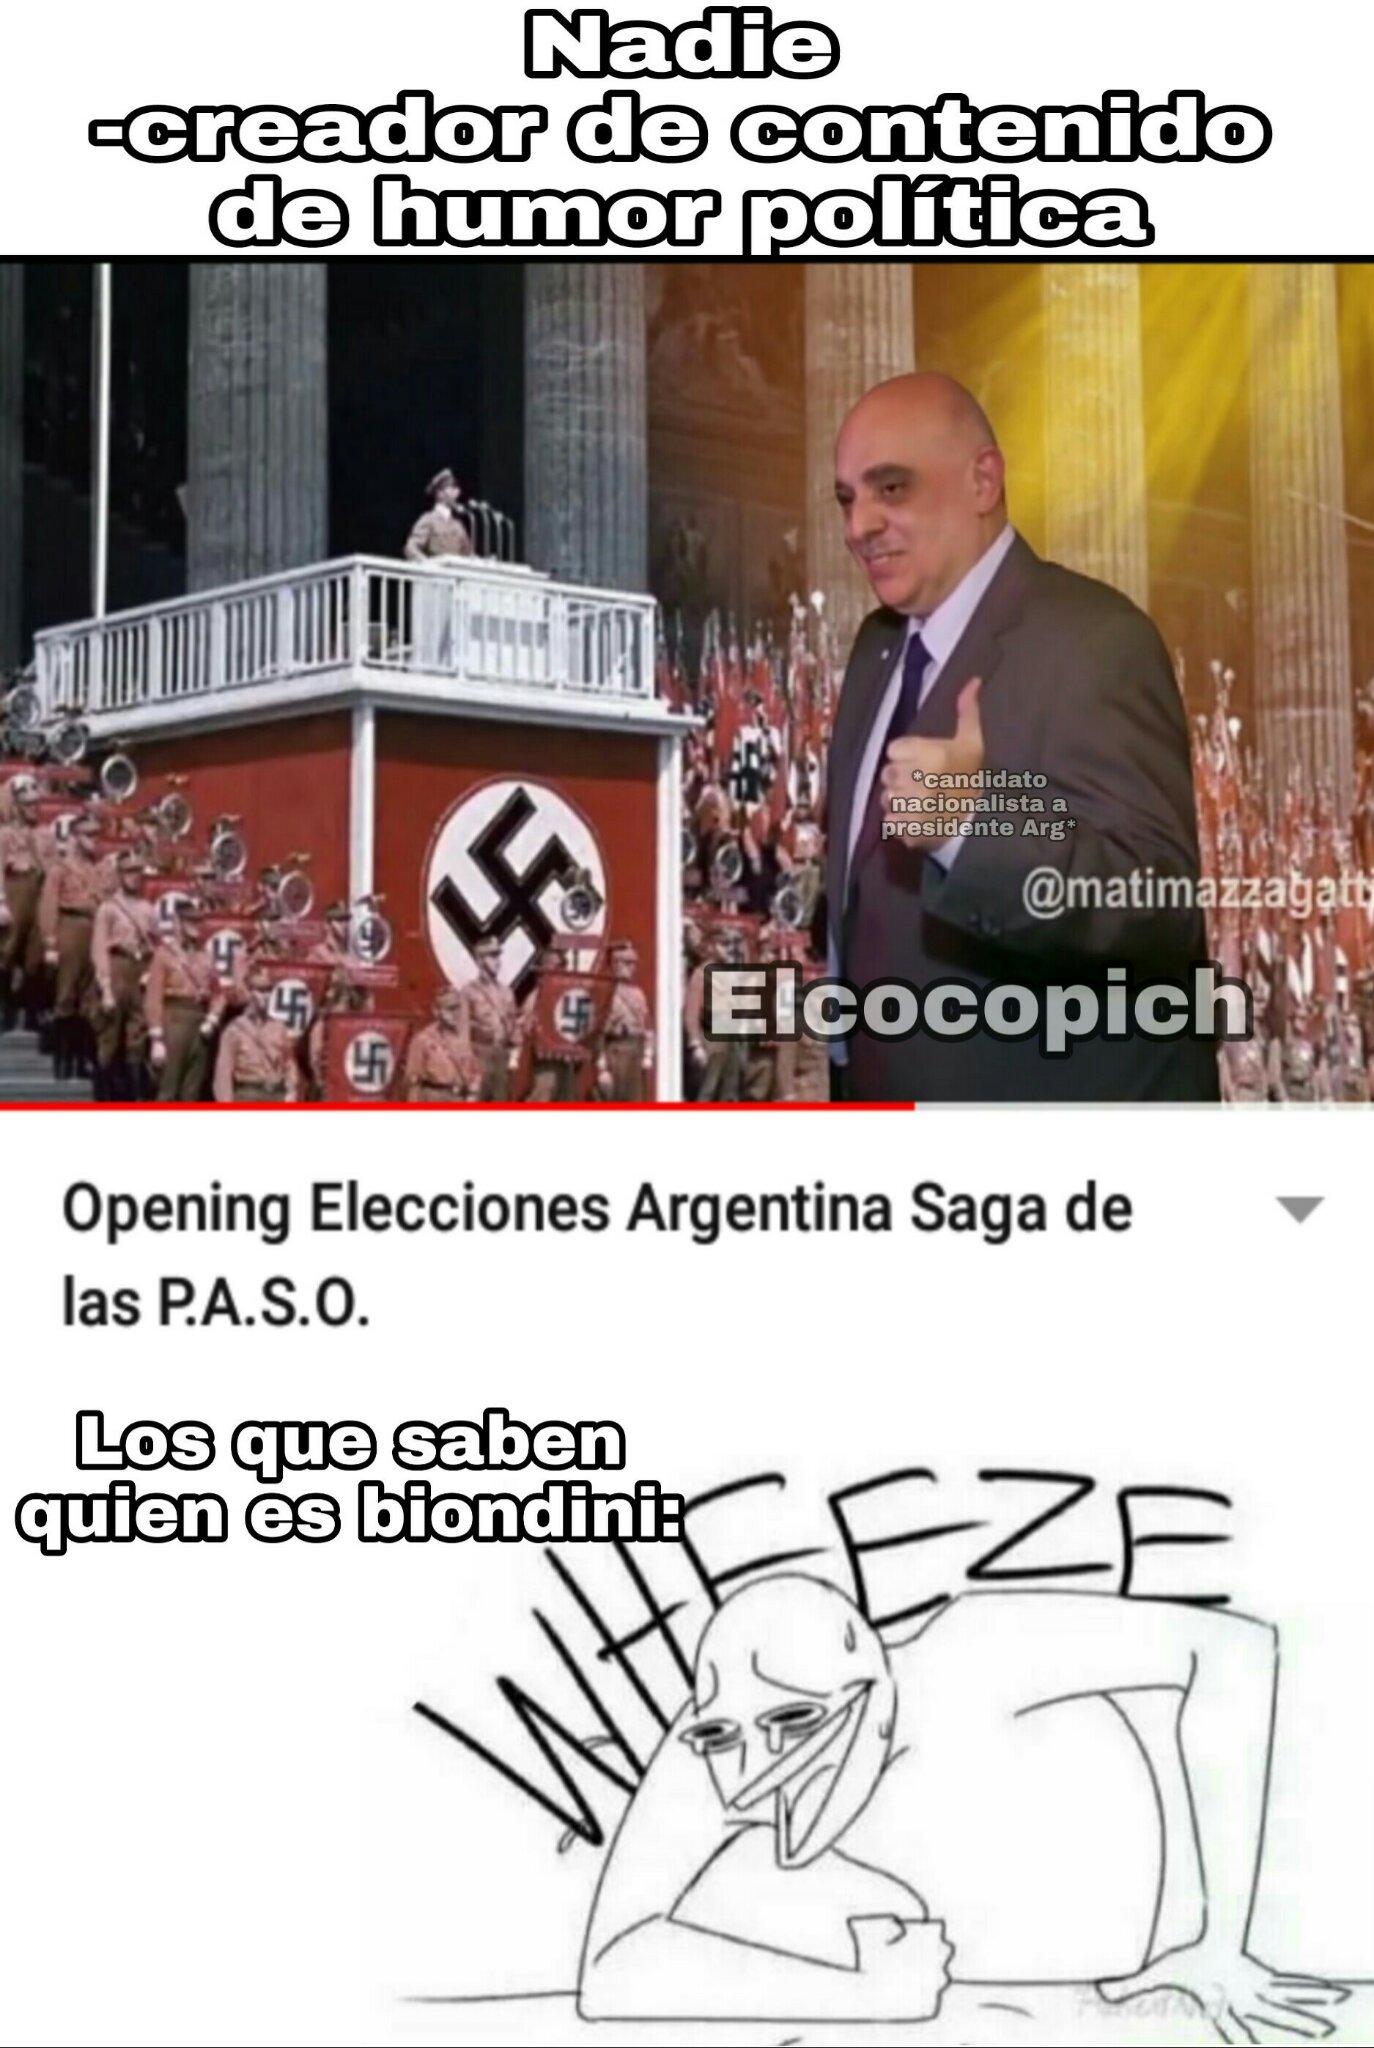 Biondini patriota, No es nazi - meme